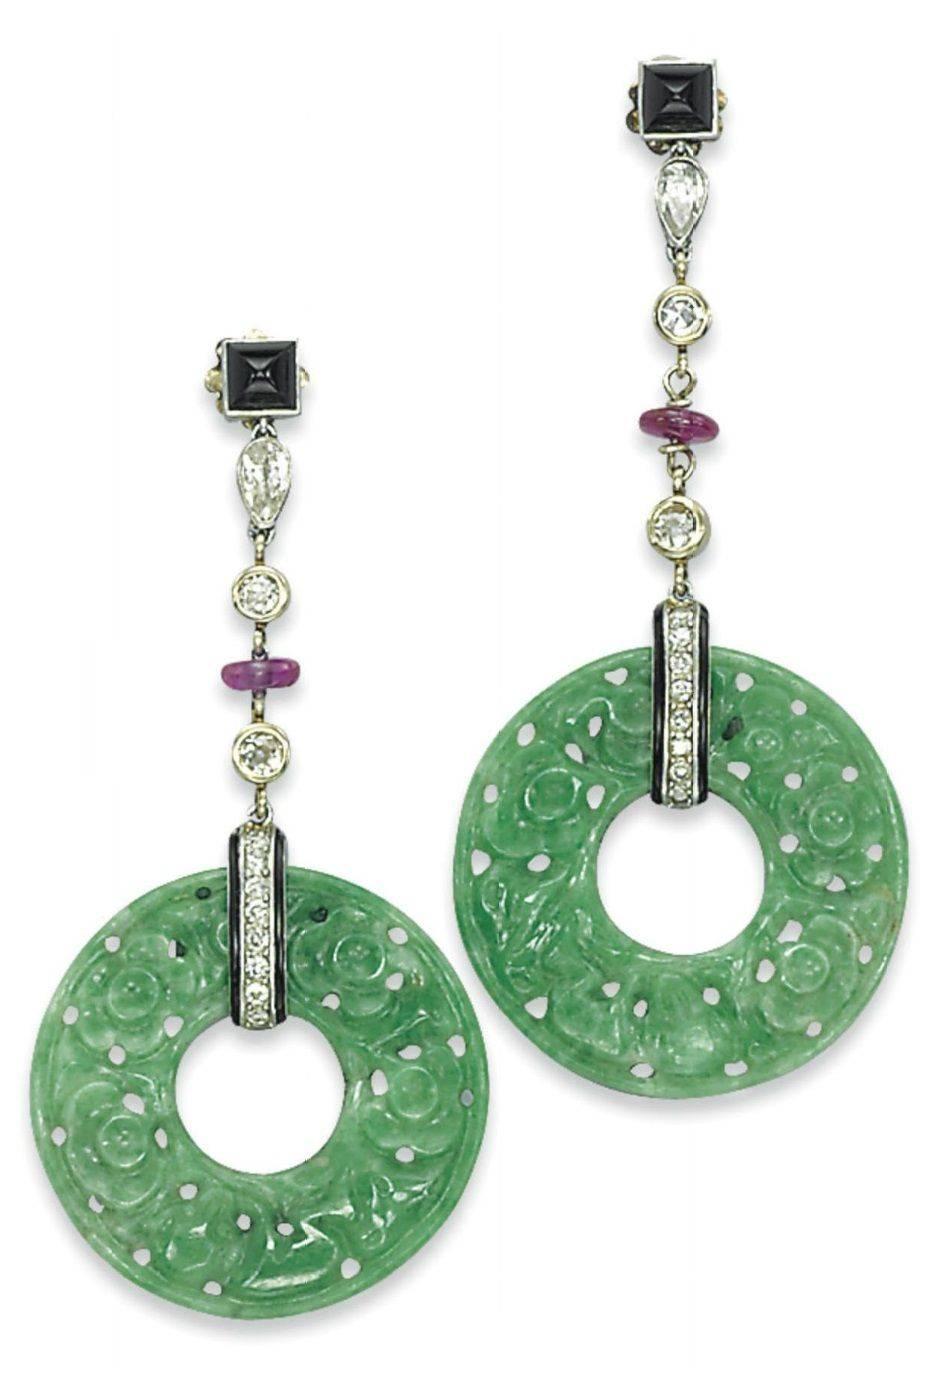 Art deco jewelry-478577897885033040